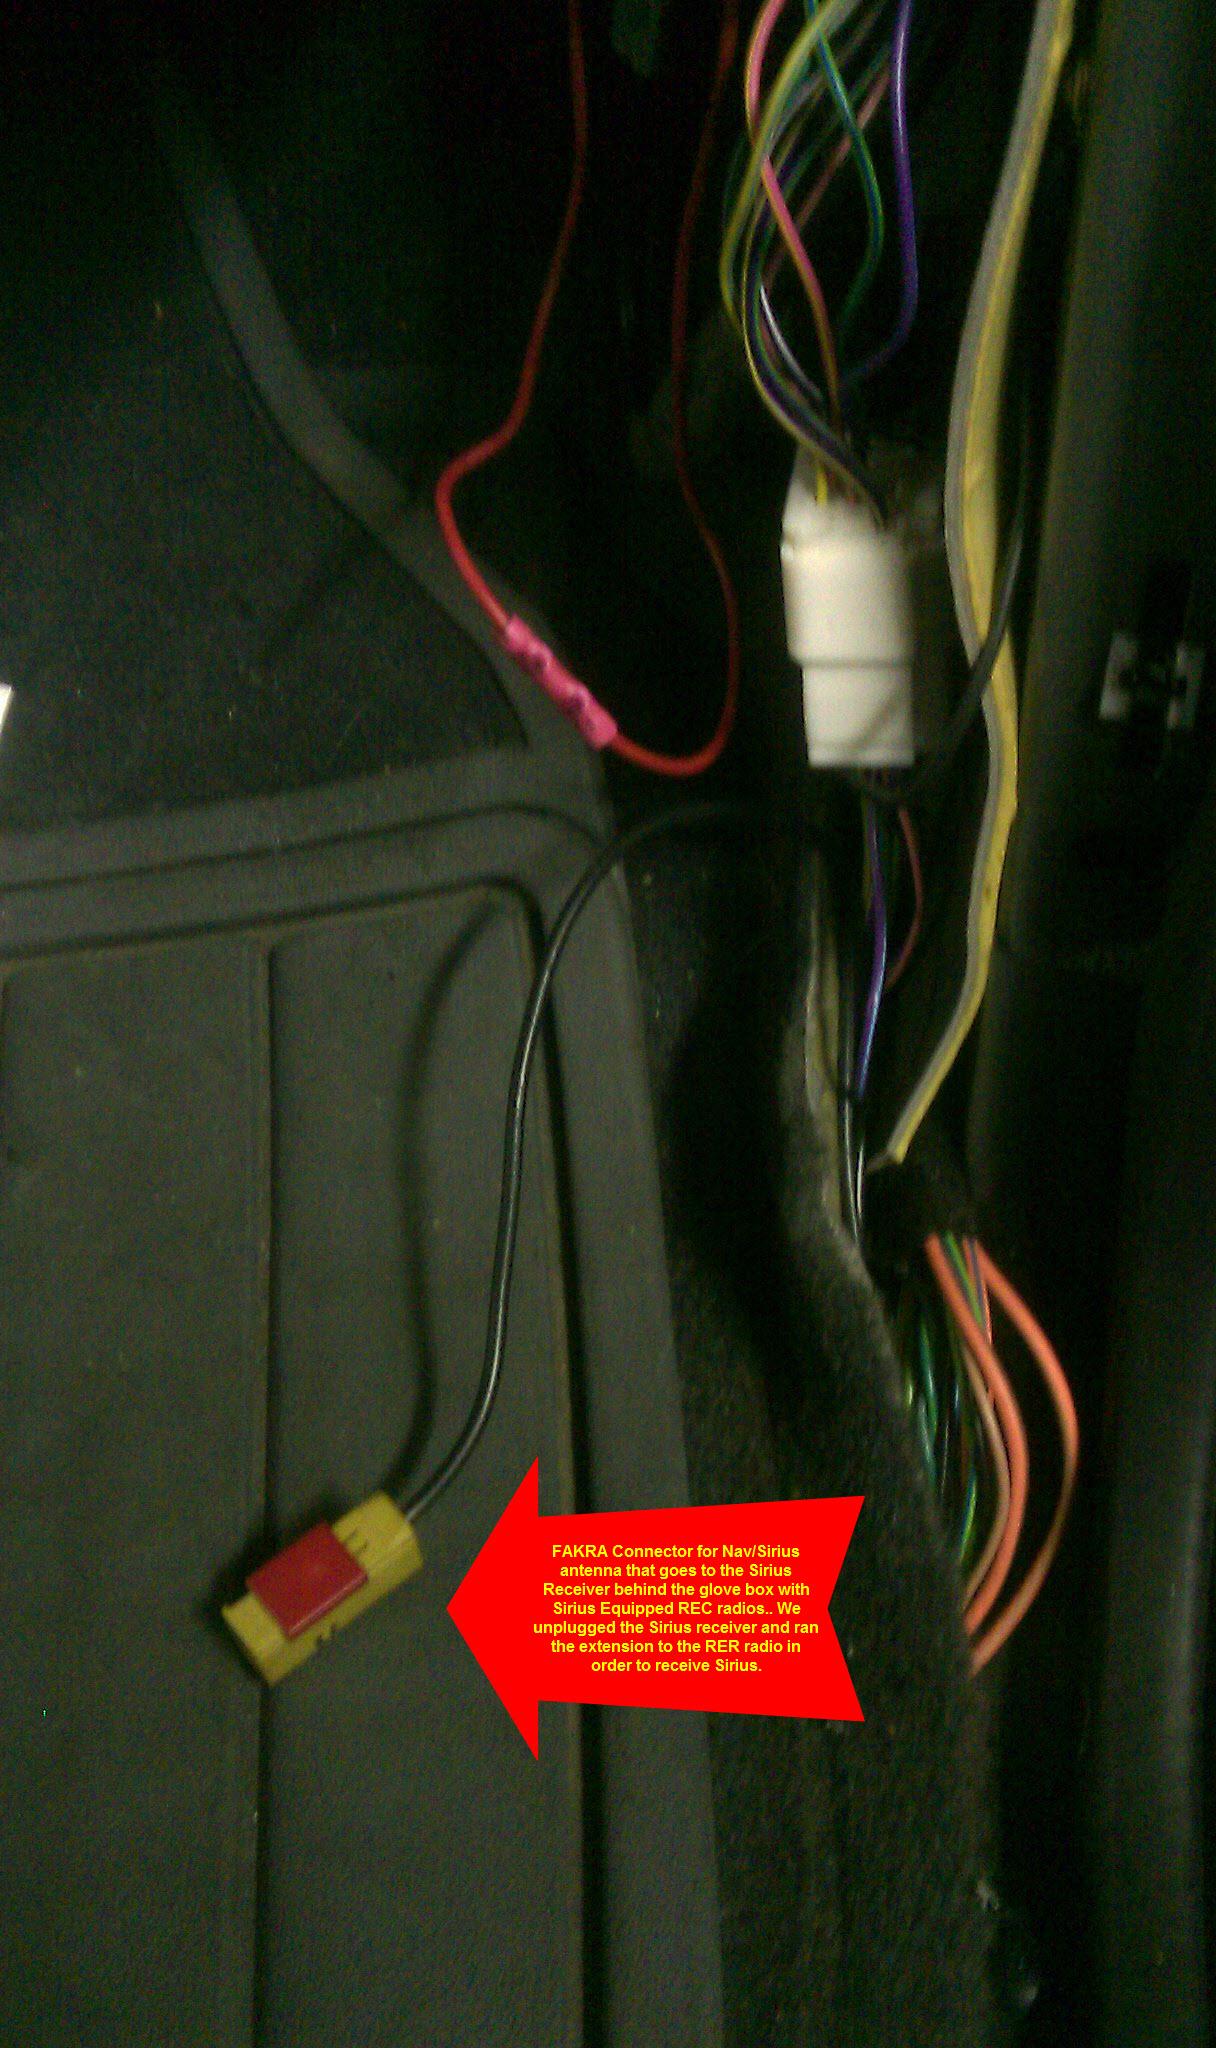 uconnect multimedia wiring diagram rec w gps sat uconnect to mygig rer gps sat uconnect upgrade  rec w gps sat uconnect to mygig rer gps